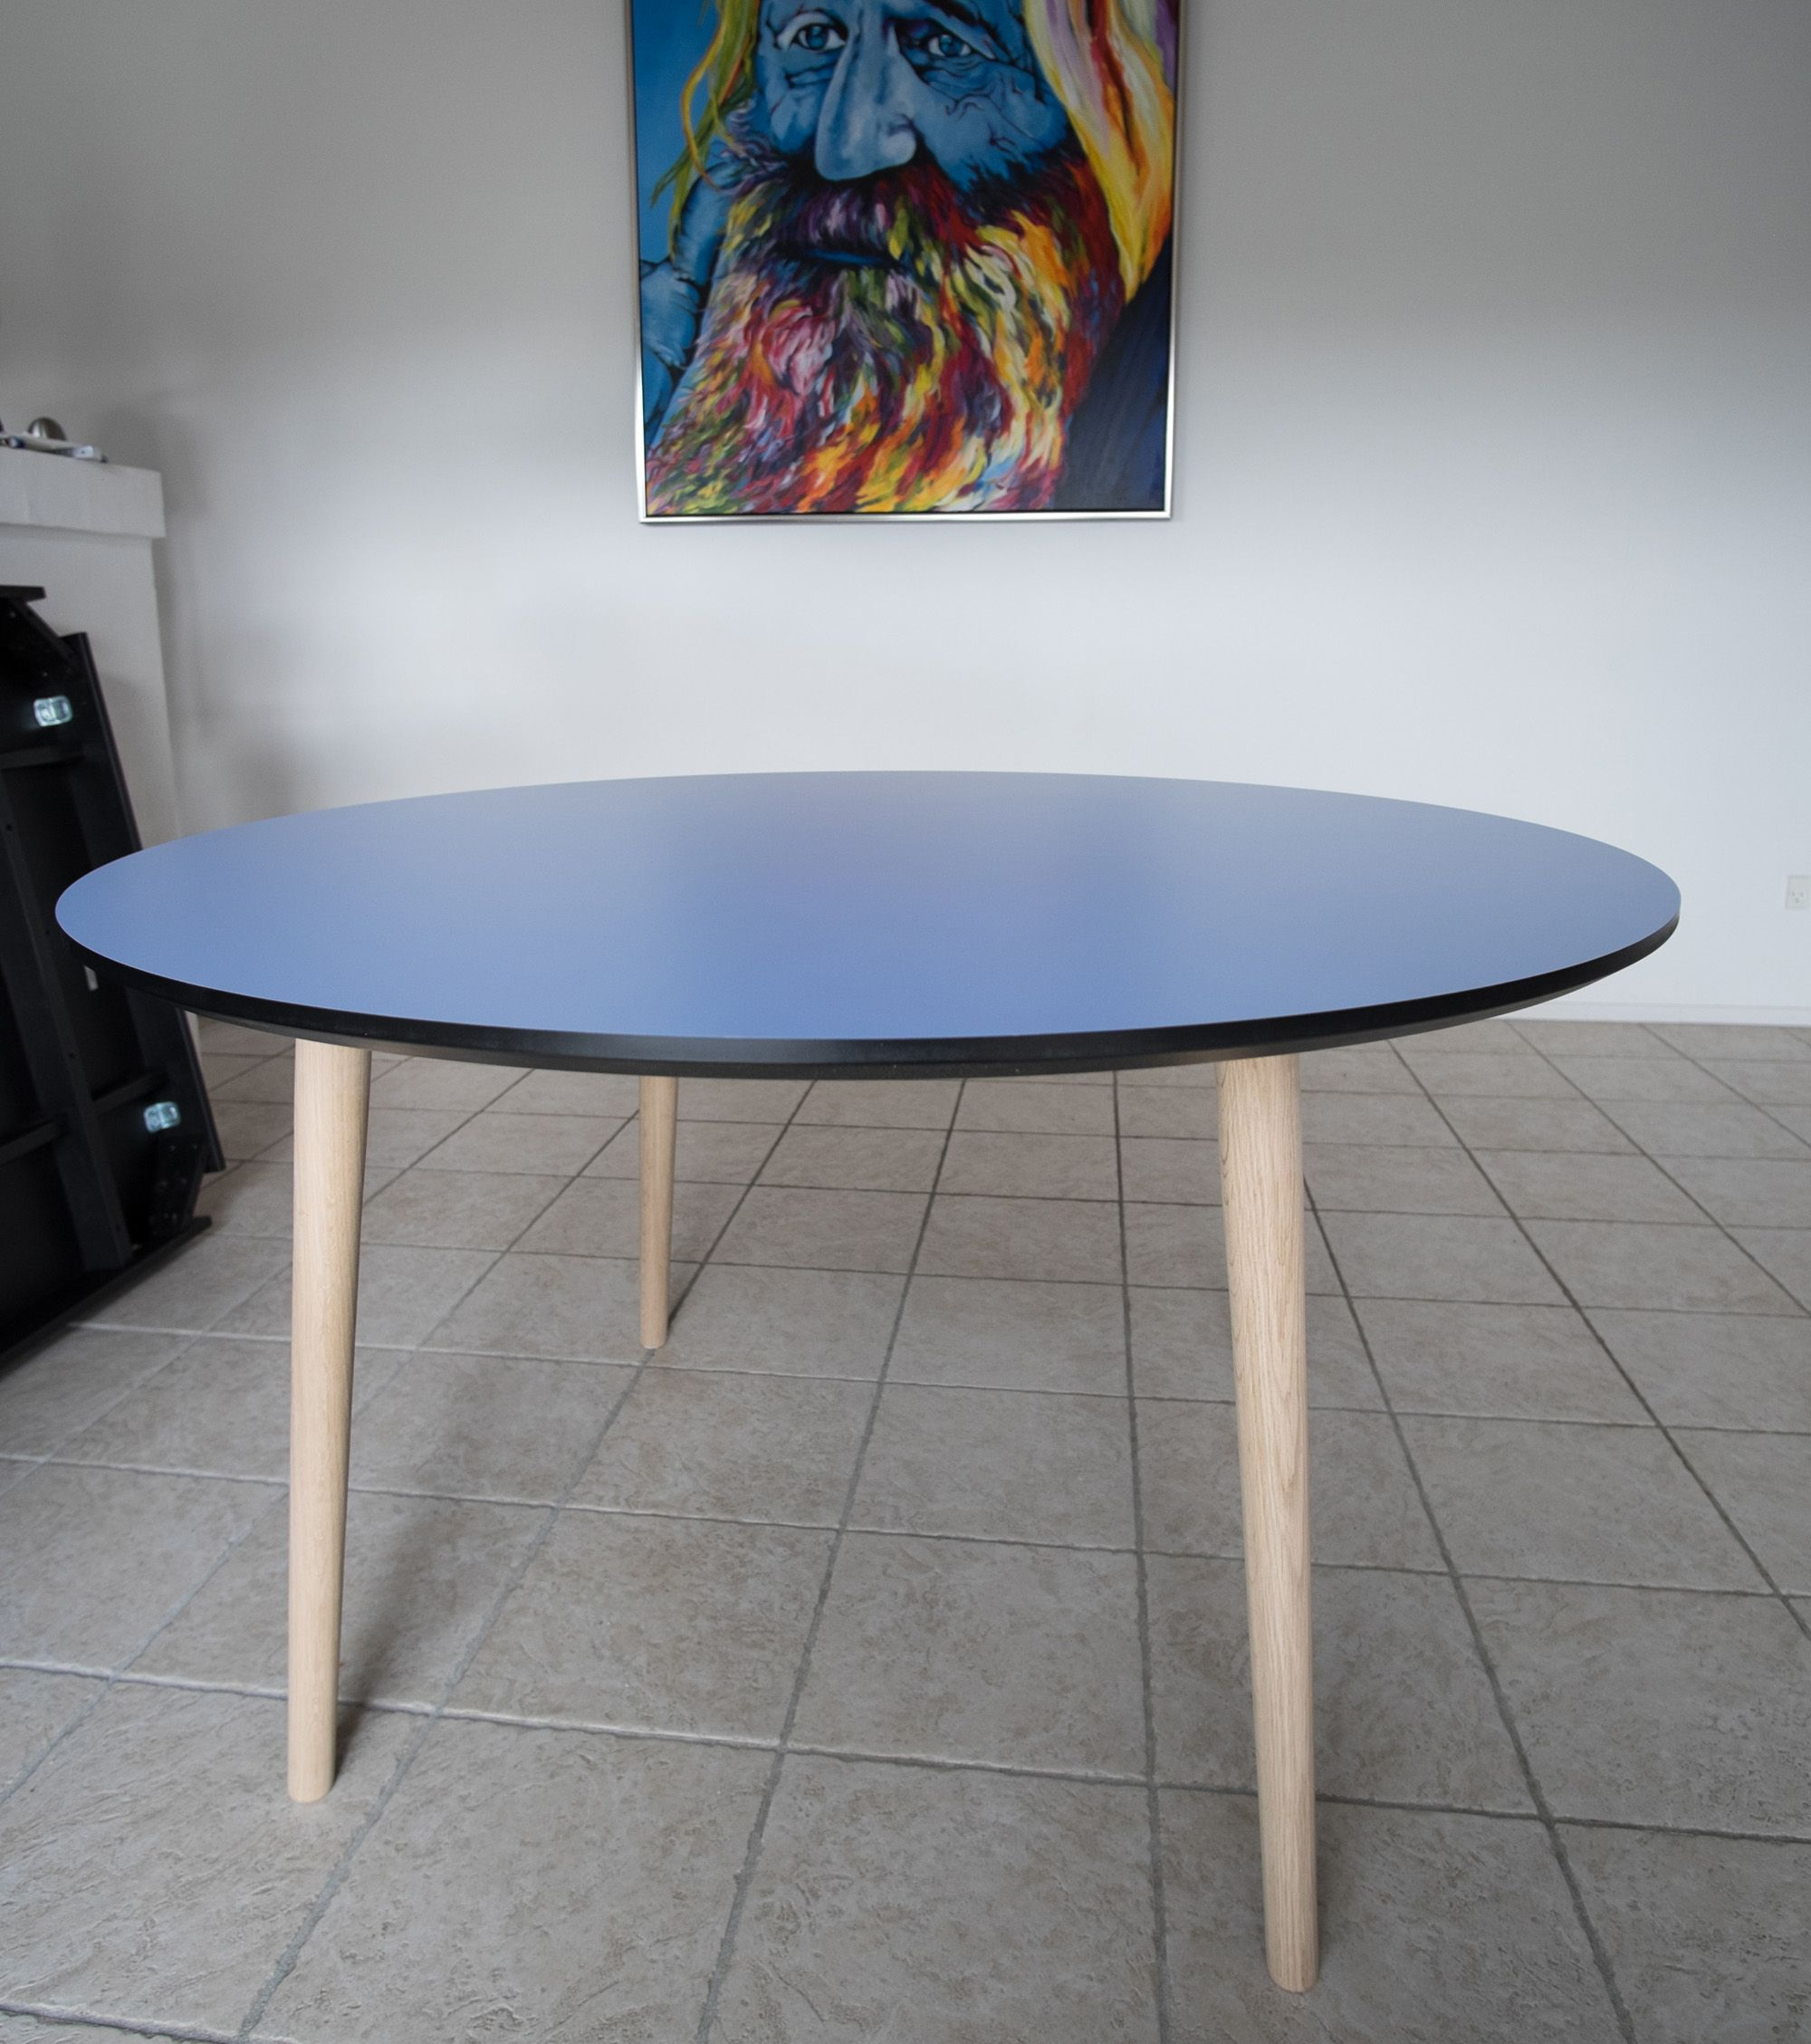 Sofa rund oval  Rund spisebord med blå laminat efter kundens eget valg. Hos Ksign ...